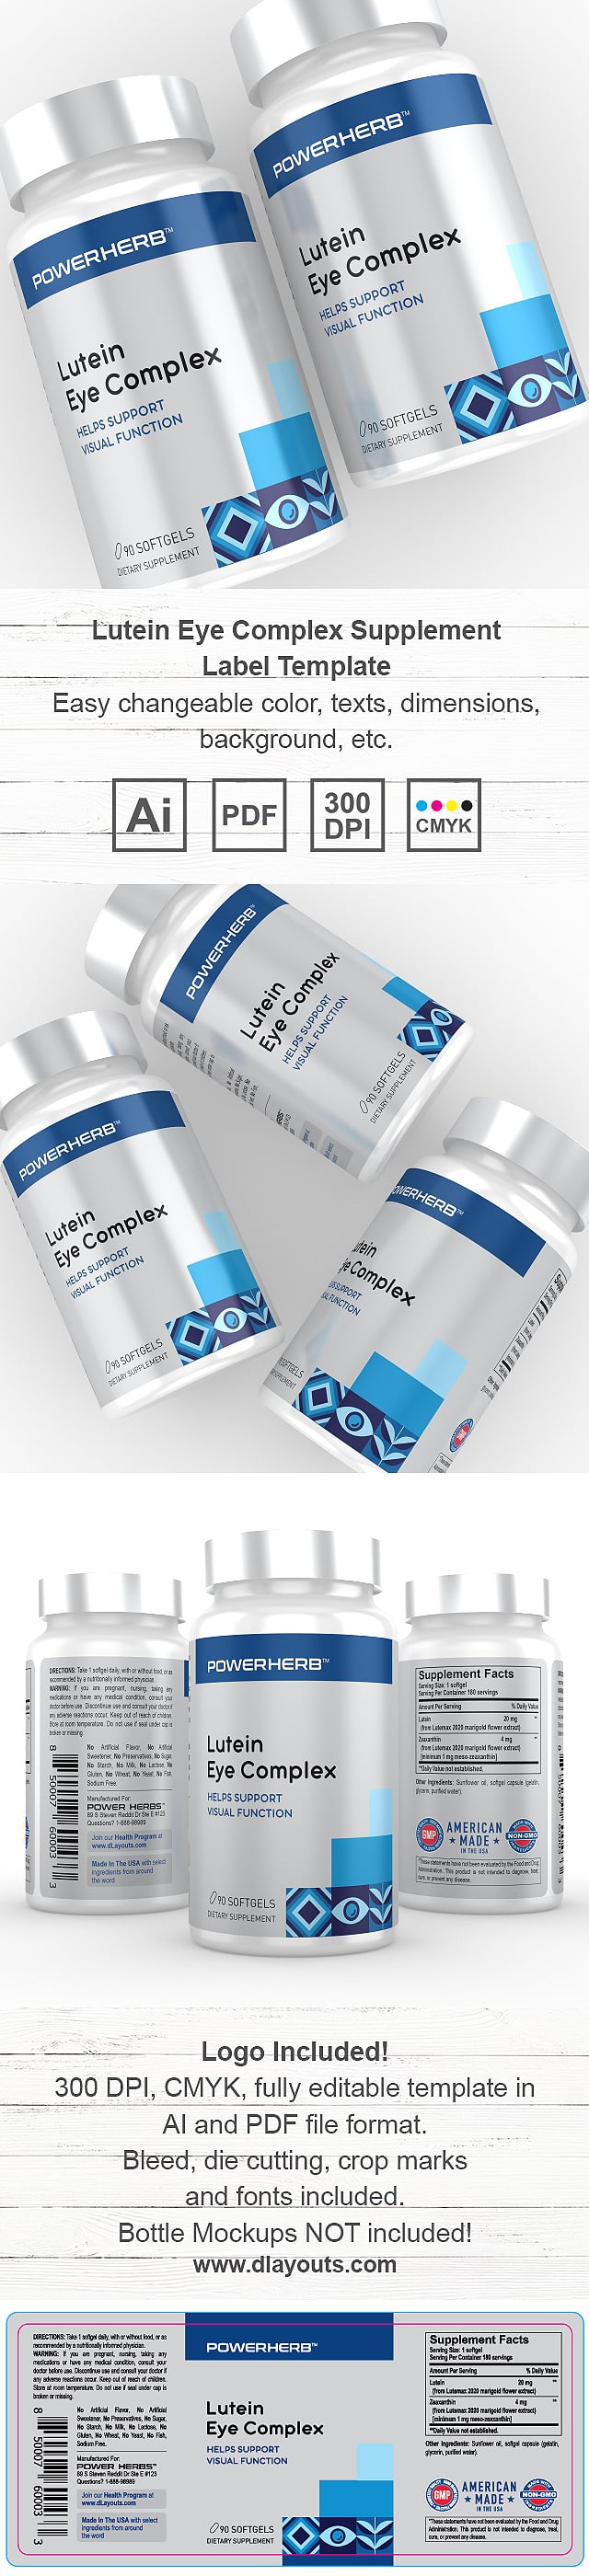 Lutein Eye Complex Supplement Label Template